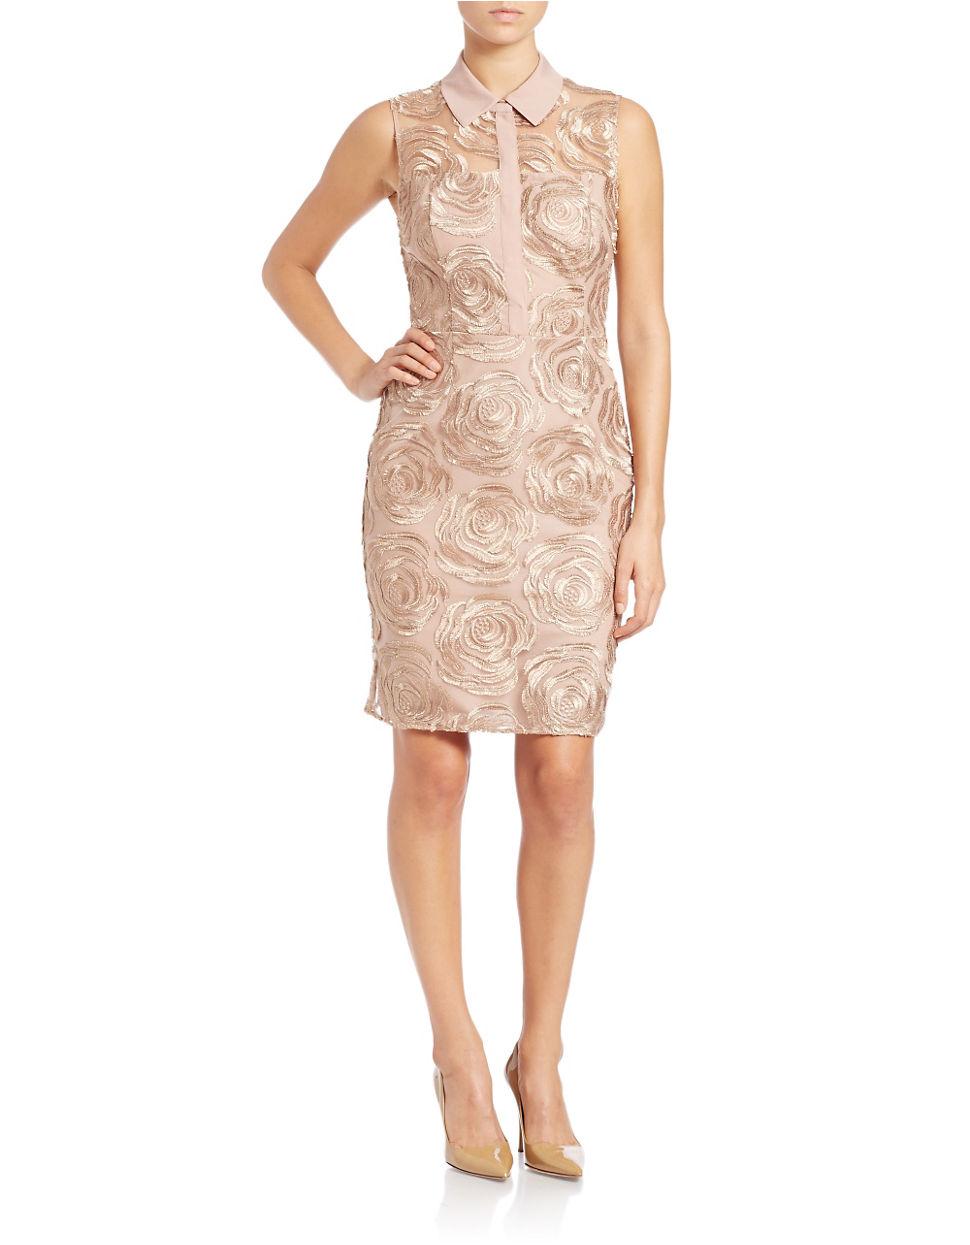 Rachel rachel roy Floral Sheath Dress in Pink | Lyst